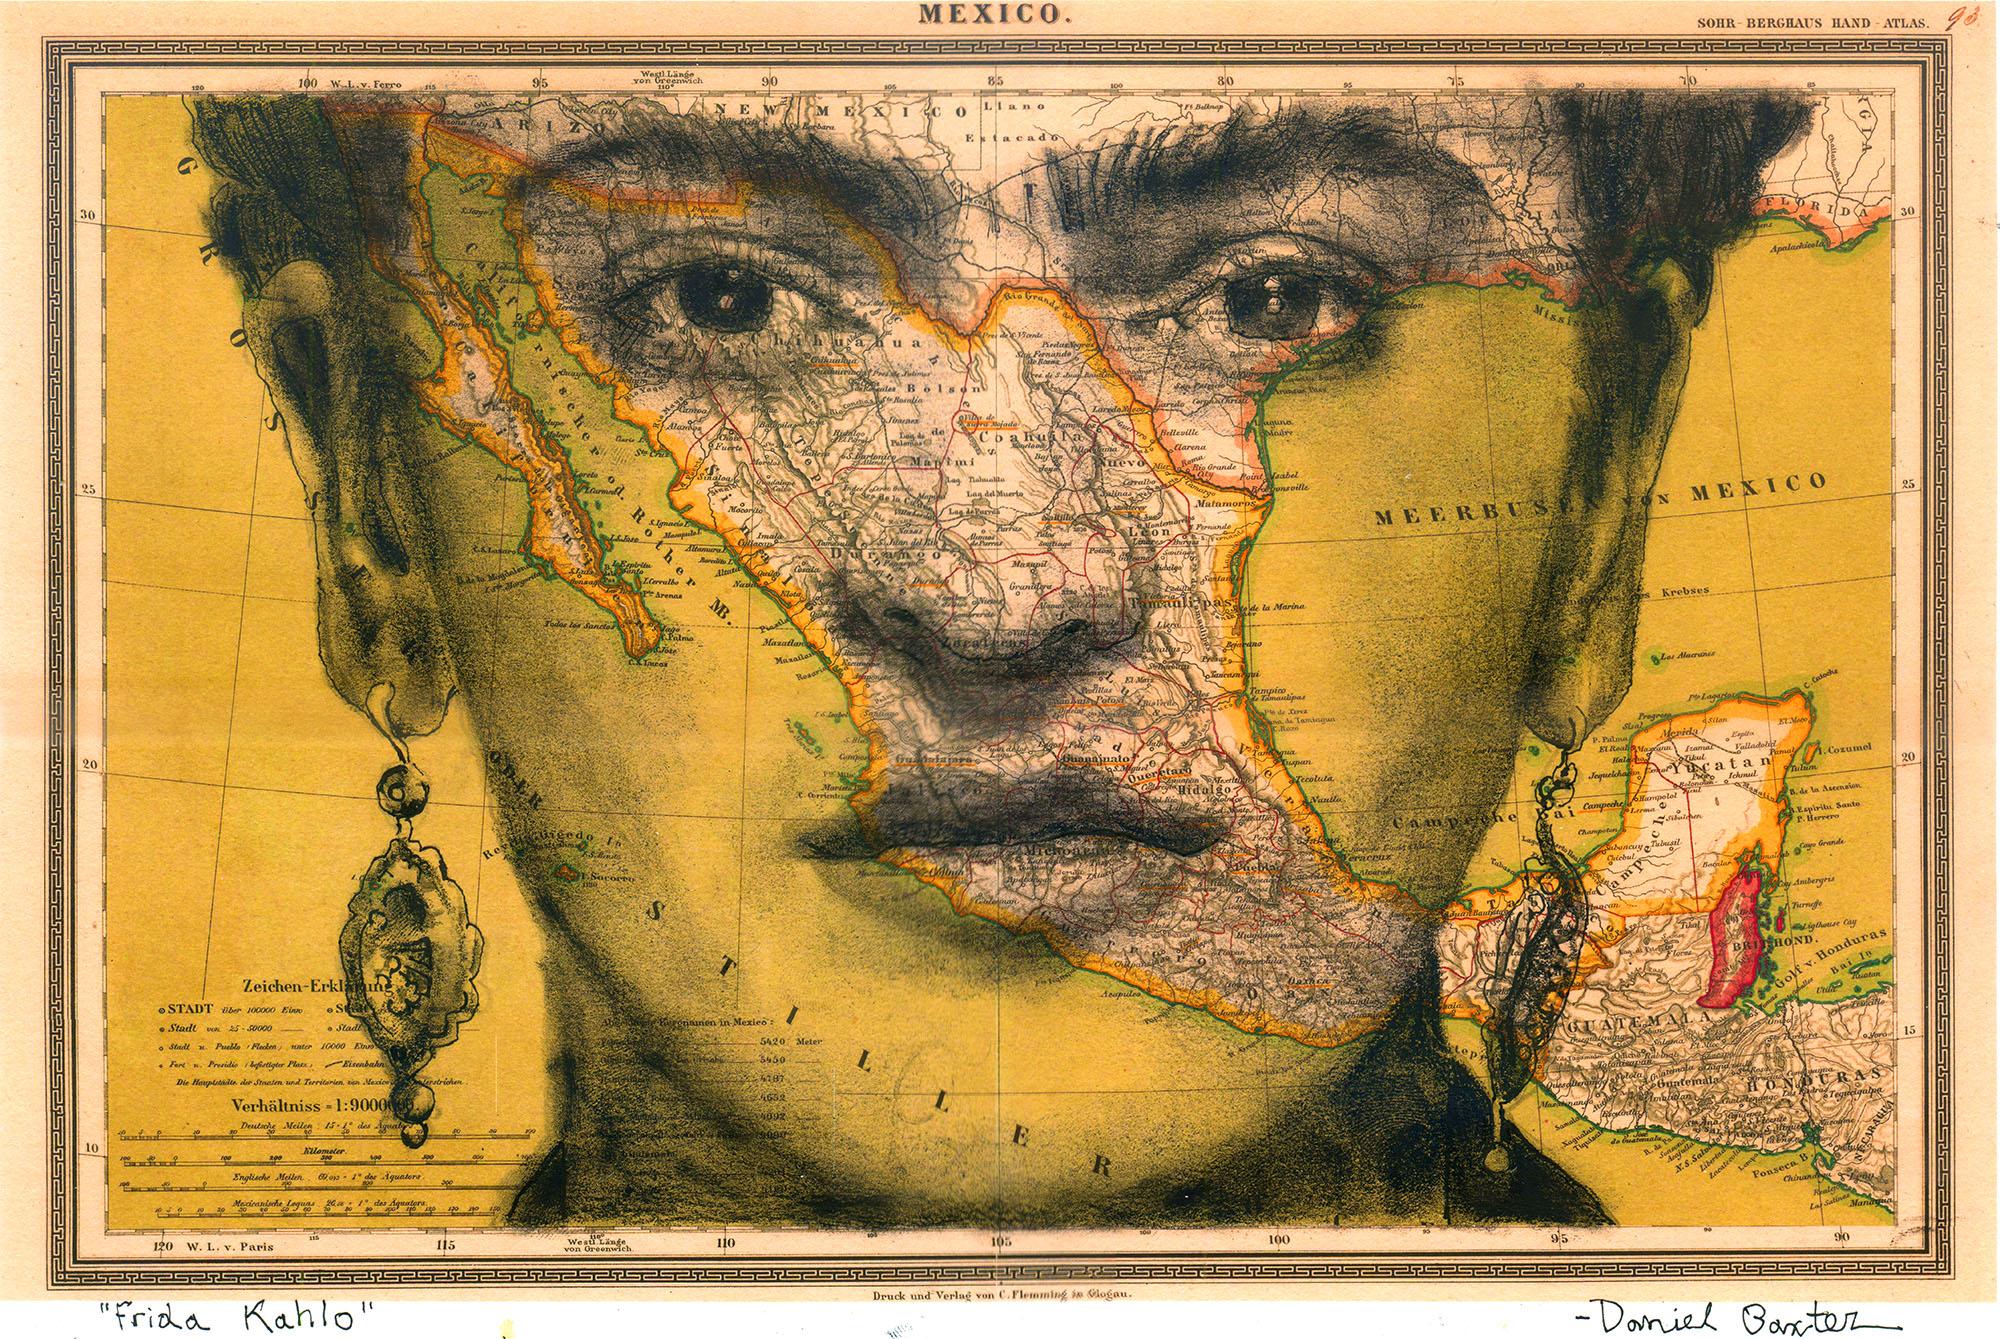 Copyright Daniel Baxter Frida Kahlo Portrait.jpg